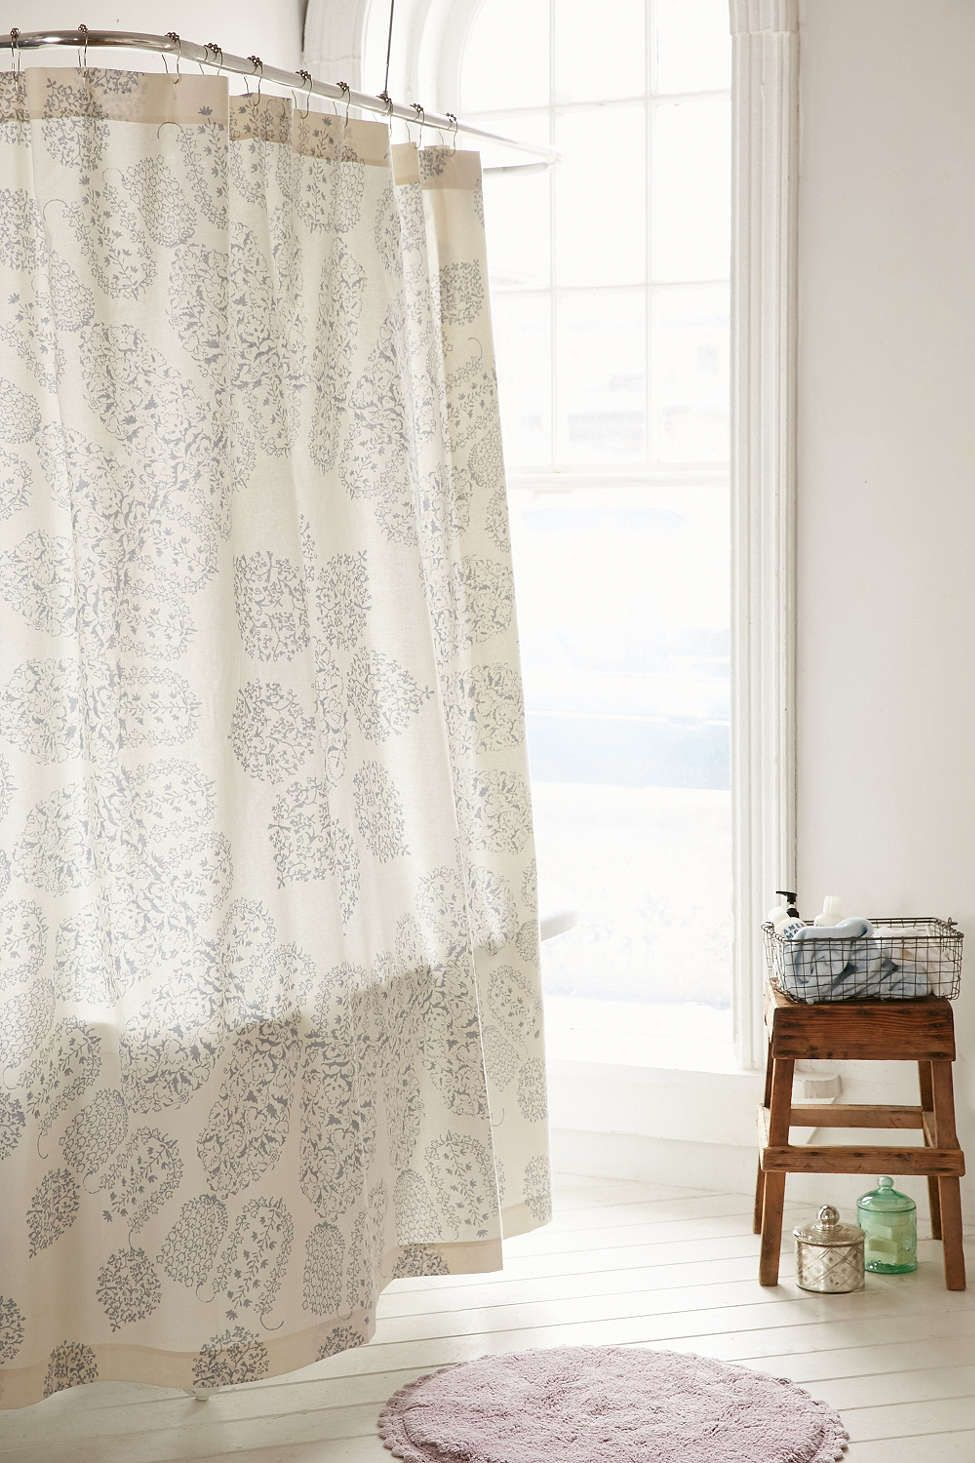 Shower Curtain Liner Curtains Shower Shower Accessories